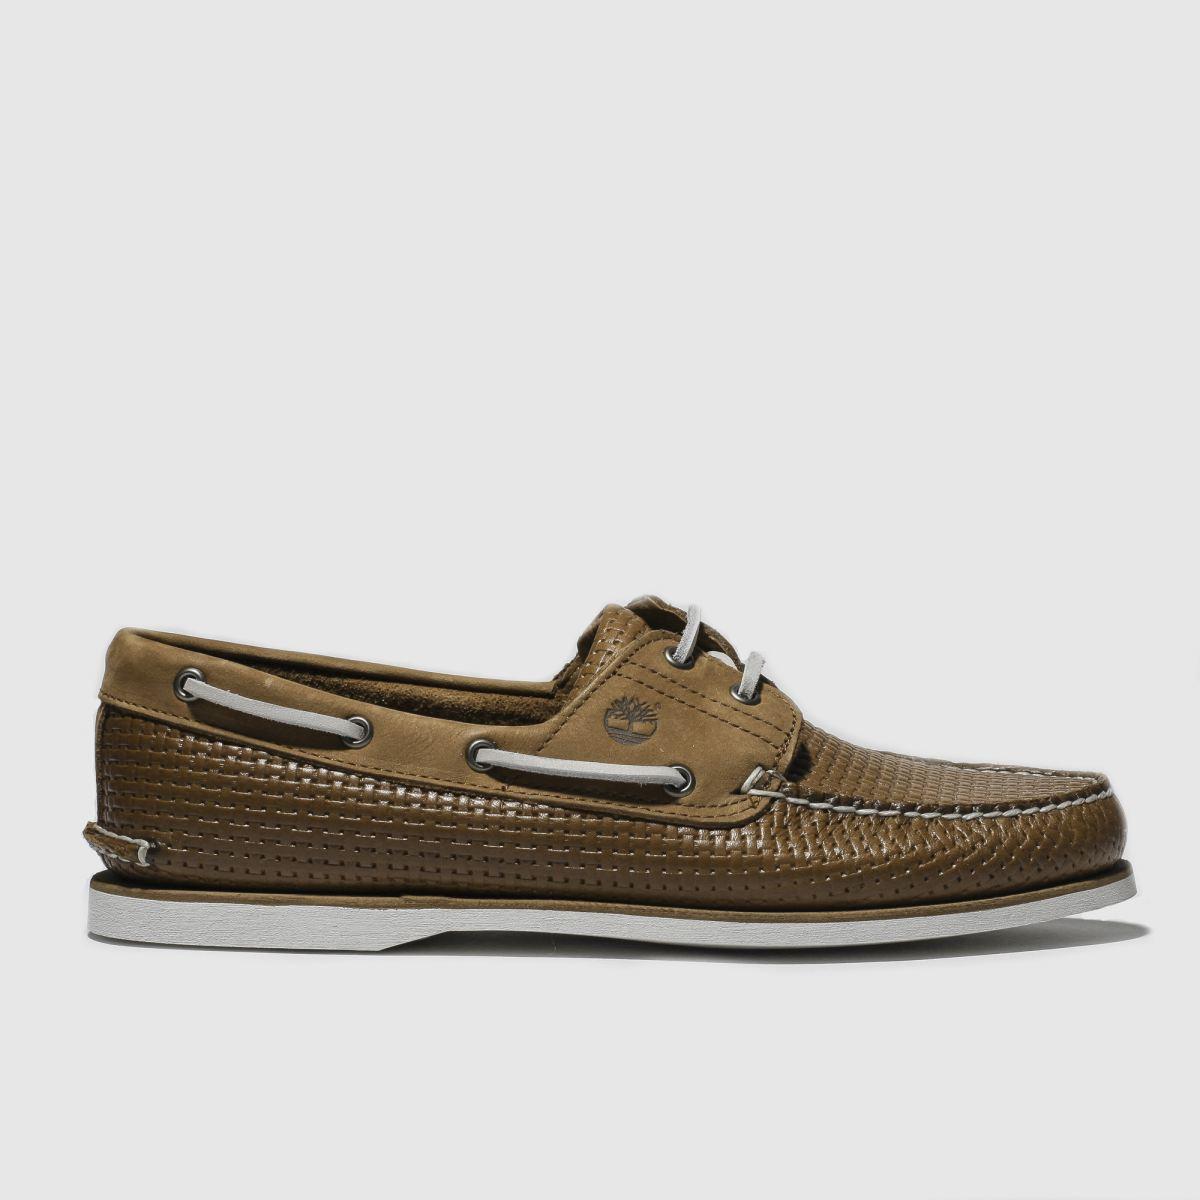 Timberland Tan Classic 2 Eye Boat Shoes